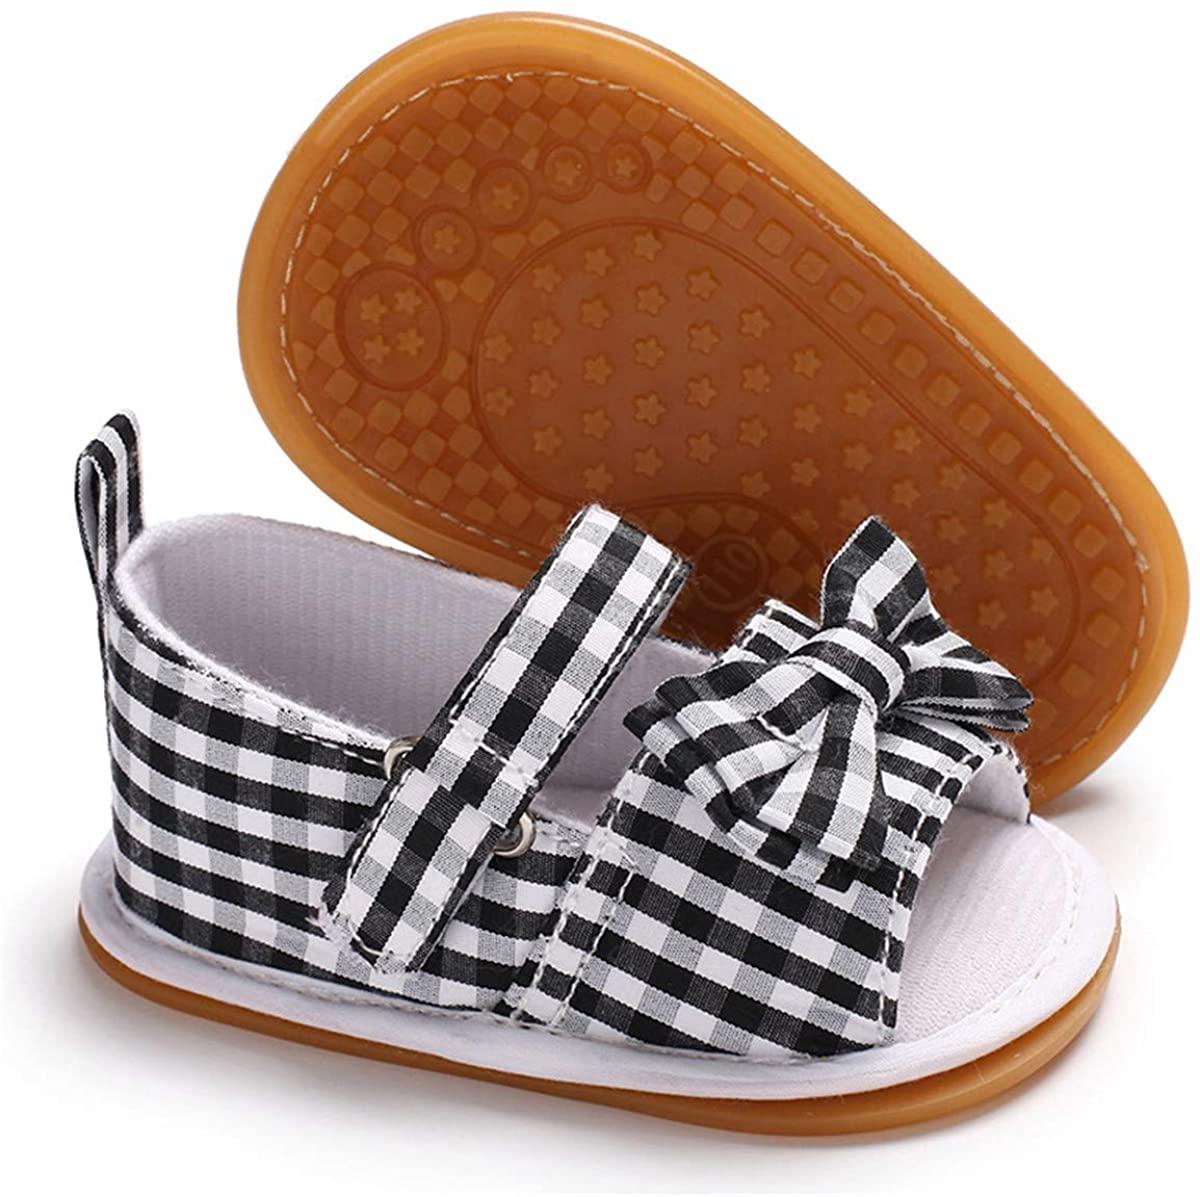 ENERCAKE Infant Baby Girls Sandals Flower Non-Slip Soft Rubber Sole Summer Shoes Toddler First Walker Crib Shoes